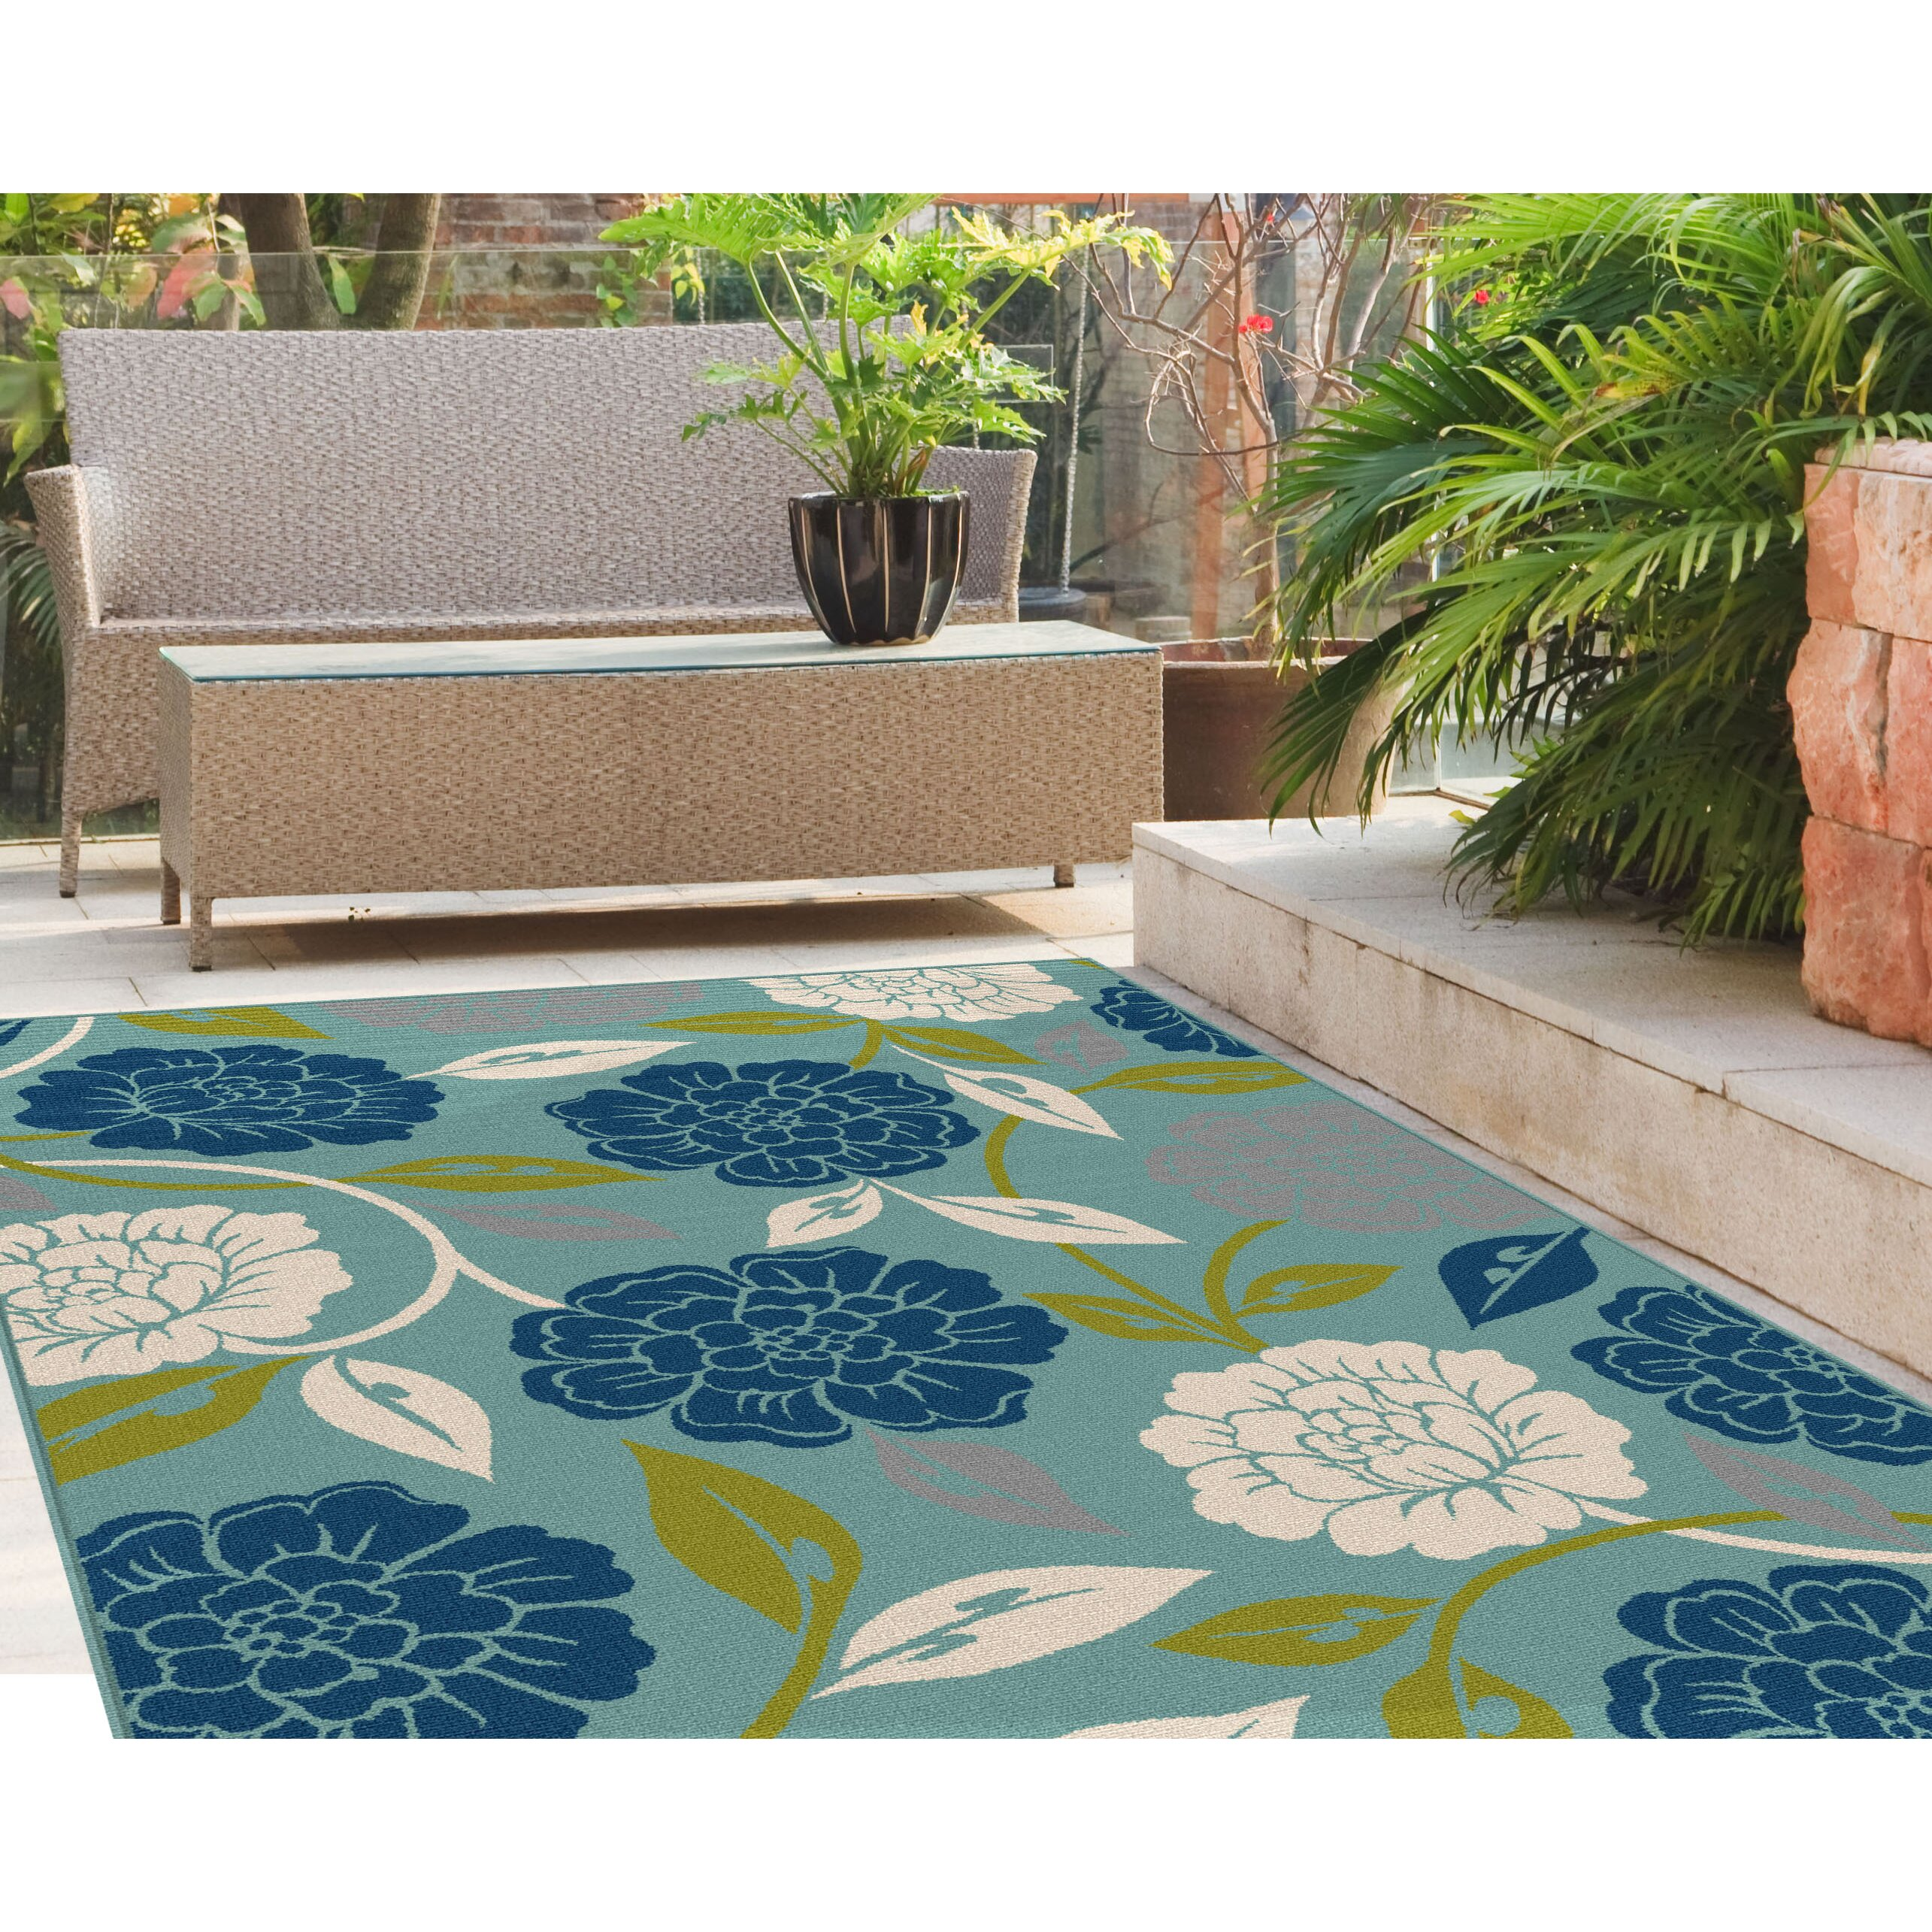 TayseRugs Garden City Aqua Indoor / Outdoor Area Rug ...